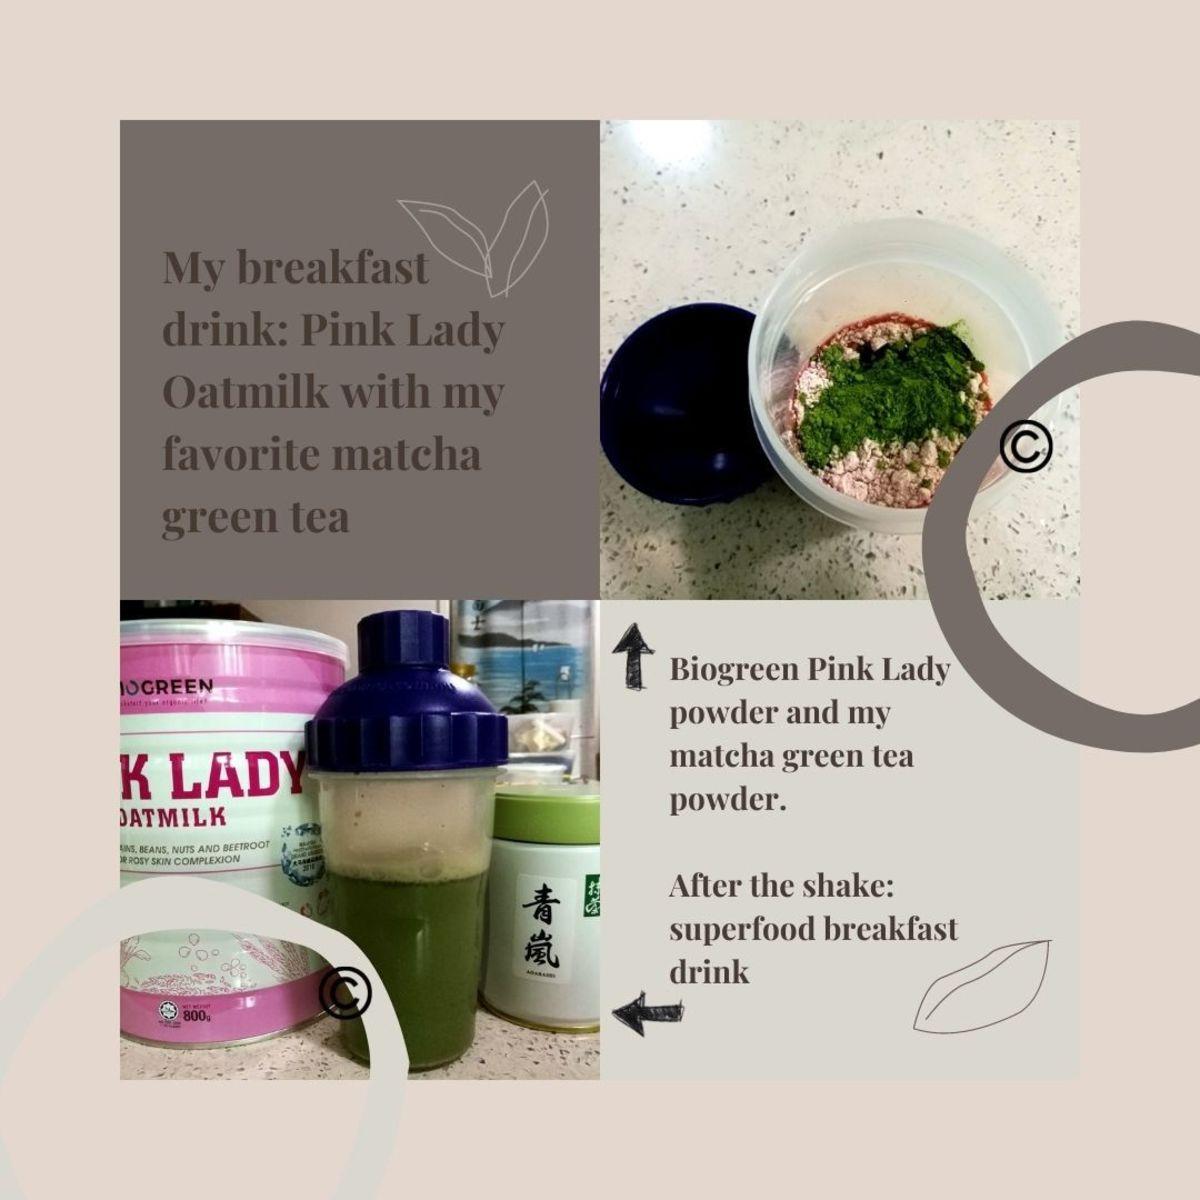 My superfood breakfast drink: Biogreen Pink Lady Oatmilk with matcha green tea